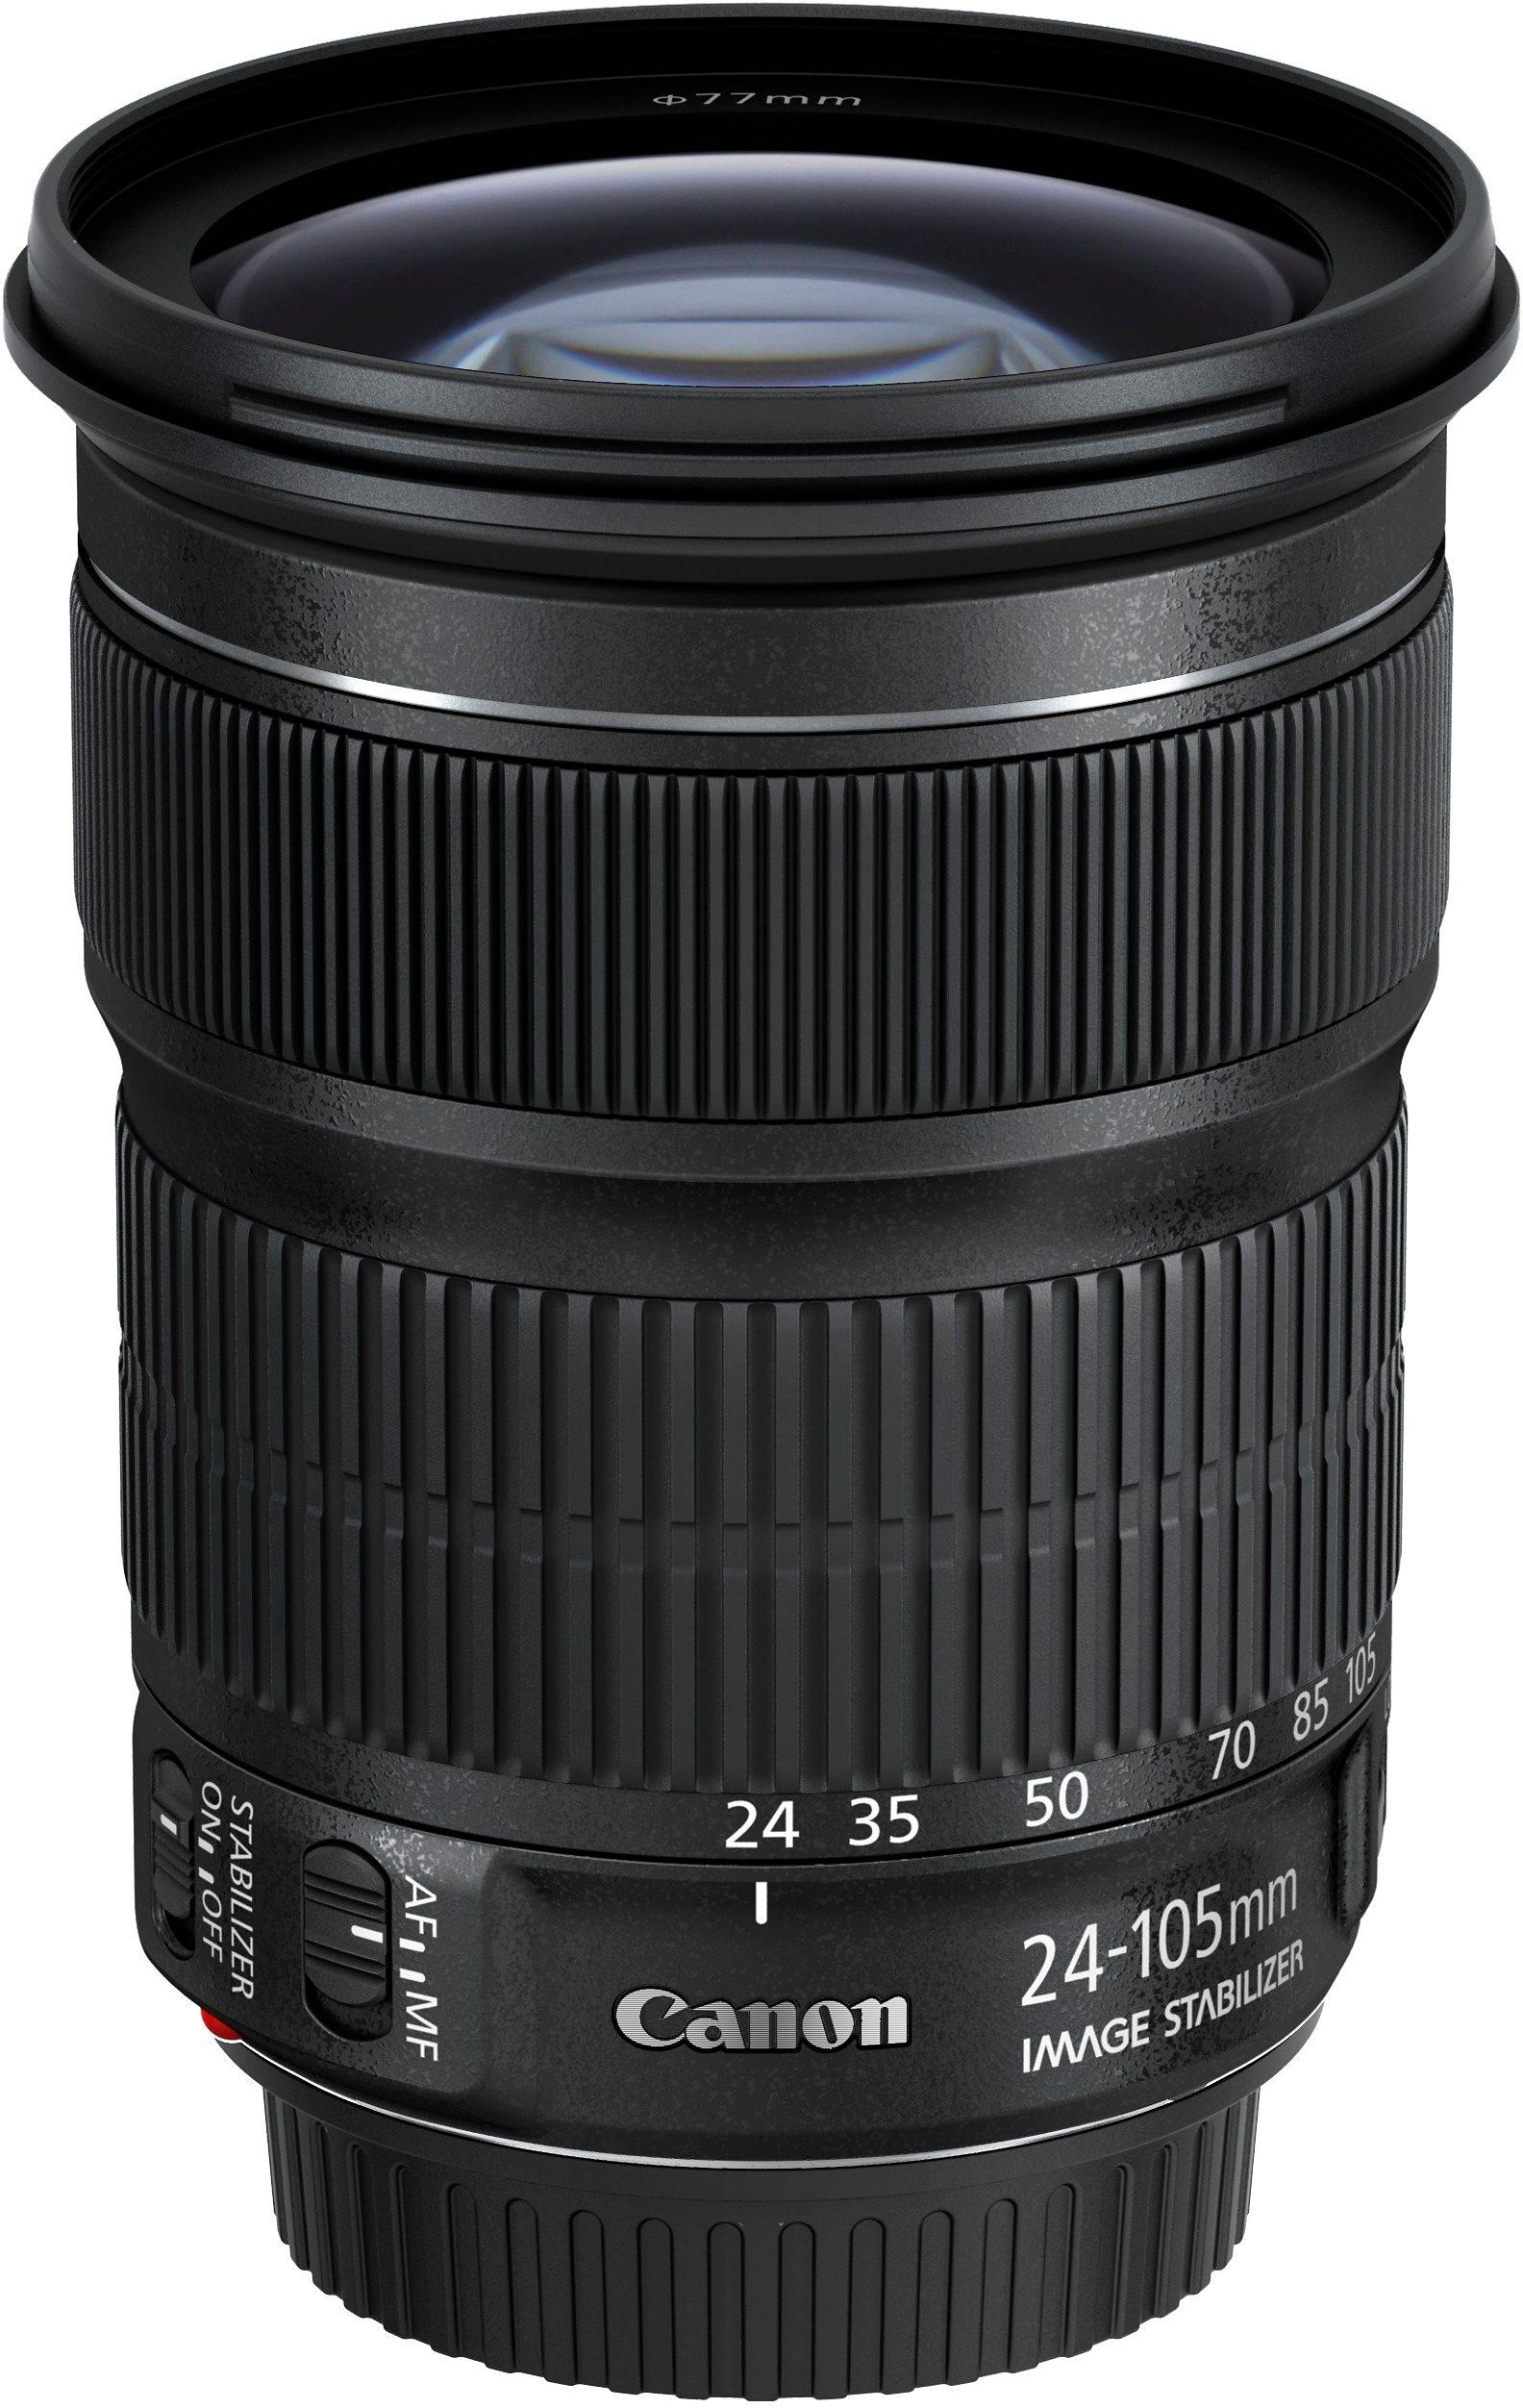 Canon EF 24-105mm 1:3,5-5,6 IS STM Standardzoom Objektiv